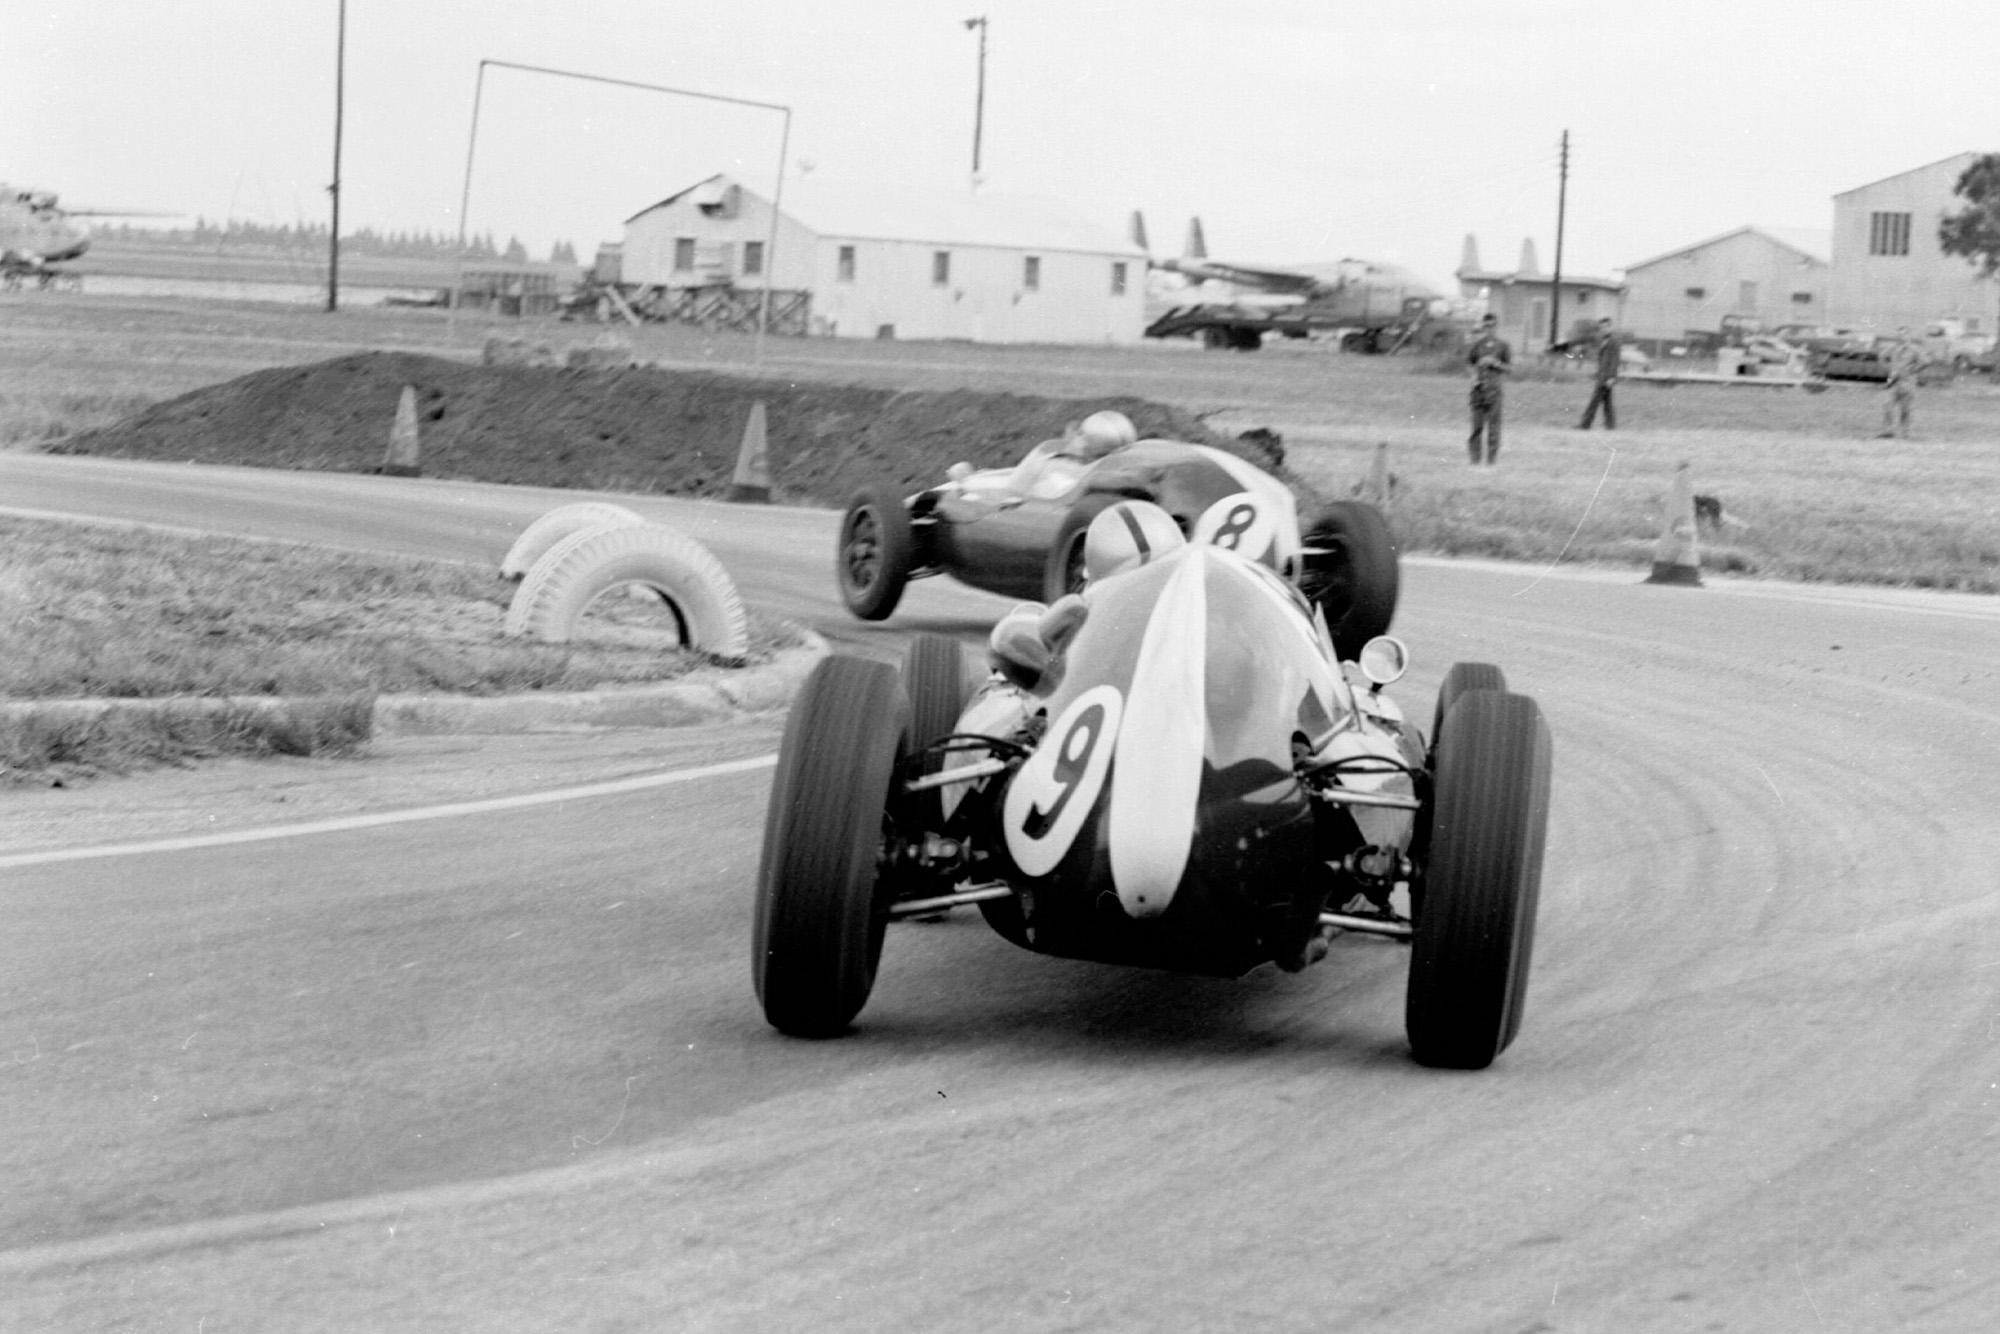 Brabham leads McLaren in the 1959 United States Grand Prix in Sebring